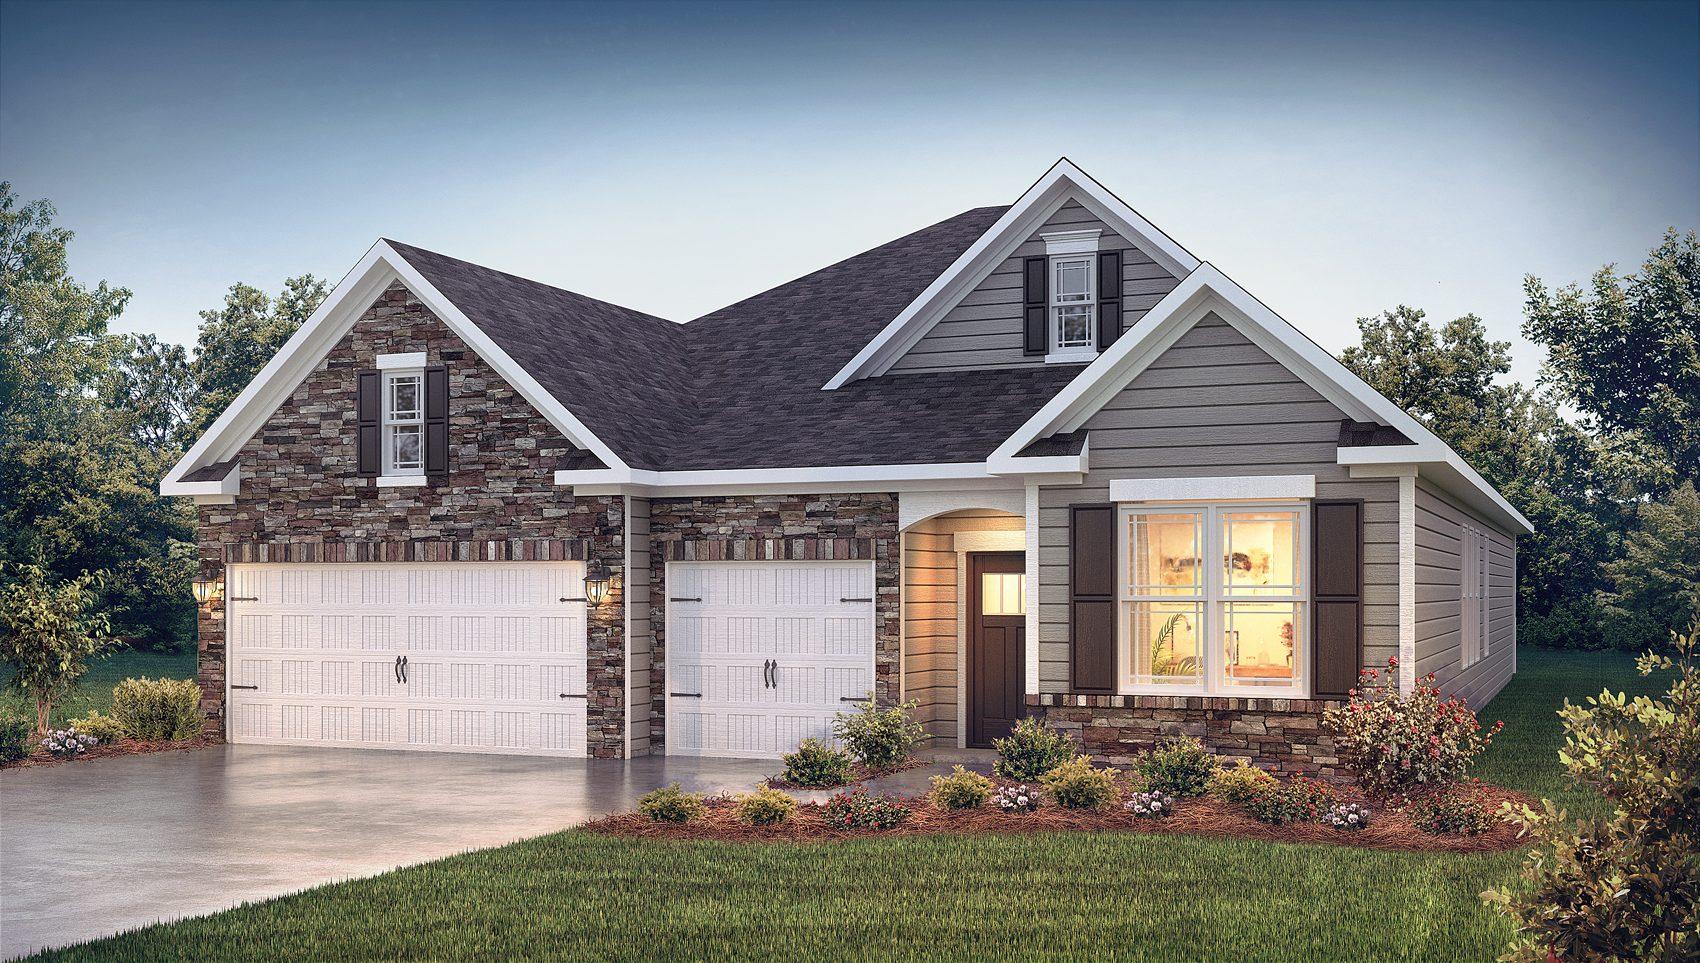 New Homes In Harrington Greenville Sc D R Horton